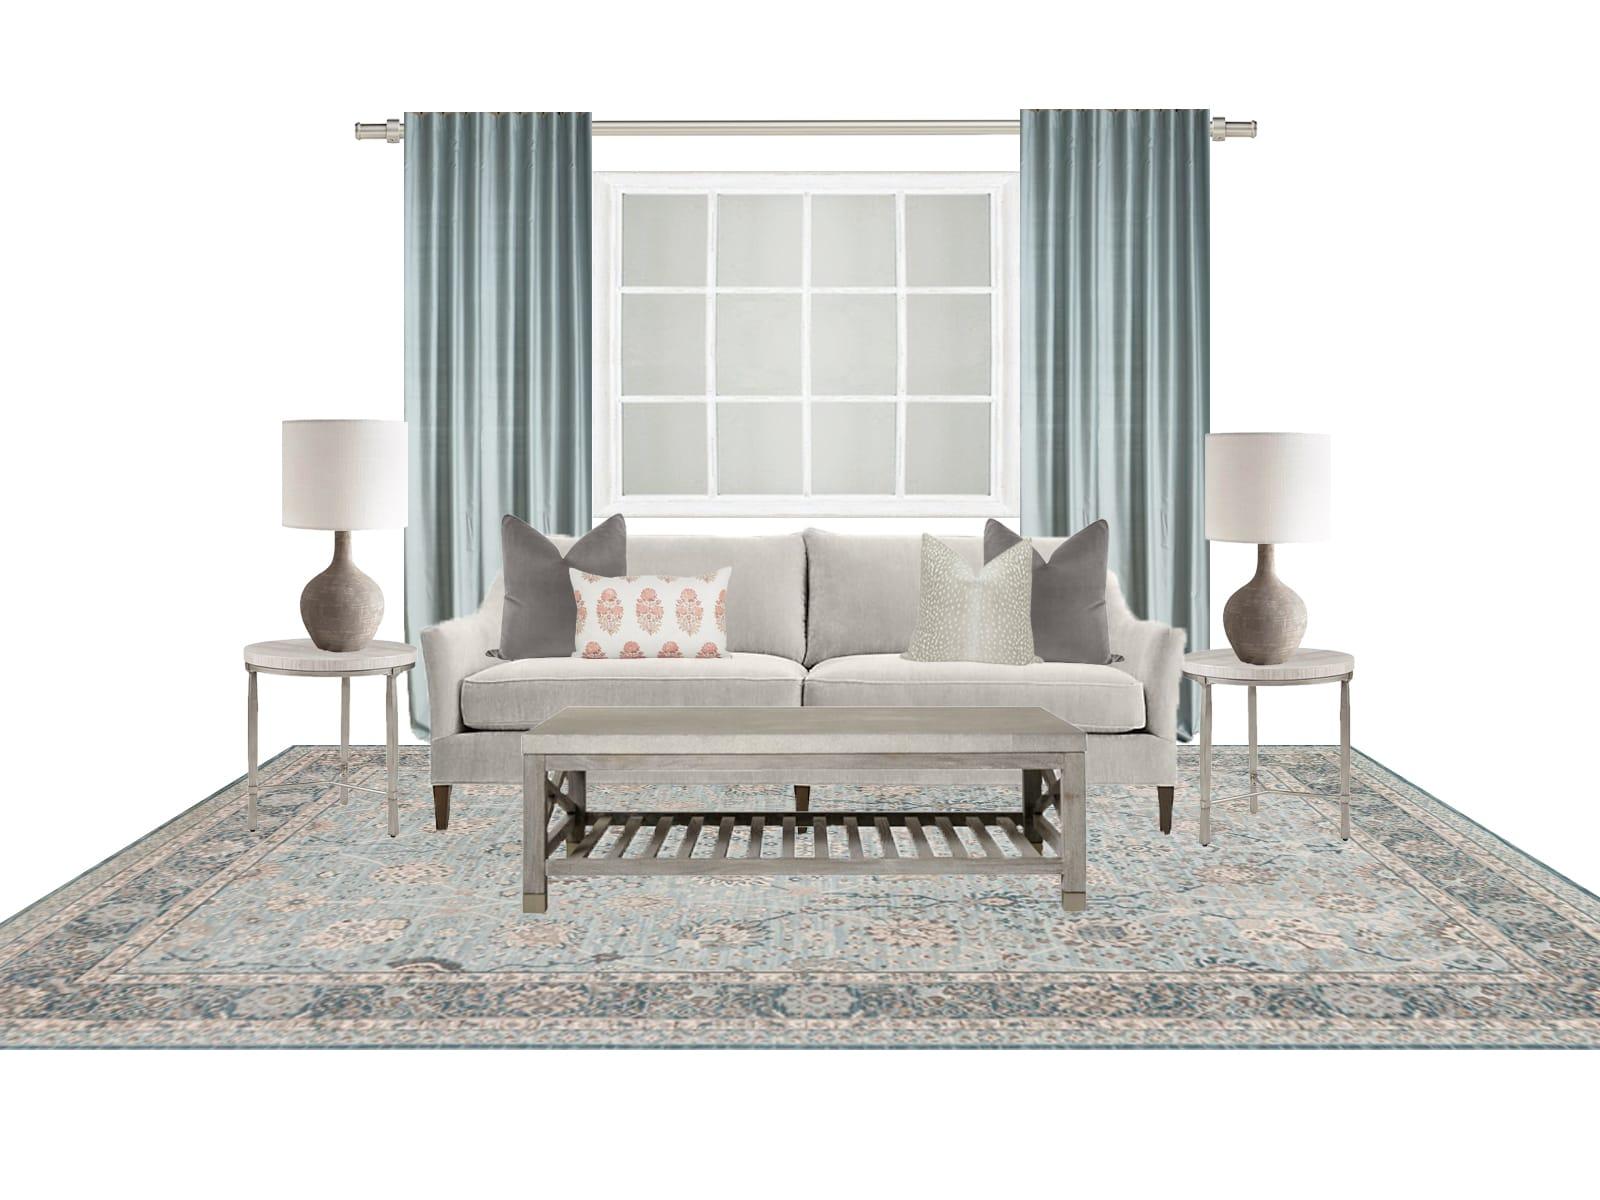 Interior Design Calm and Sophisticated Sofa